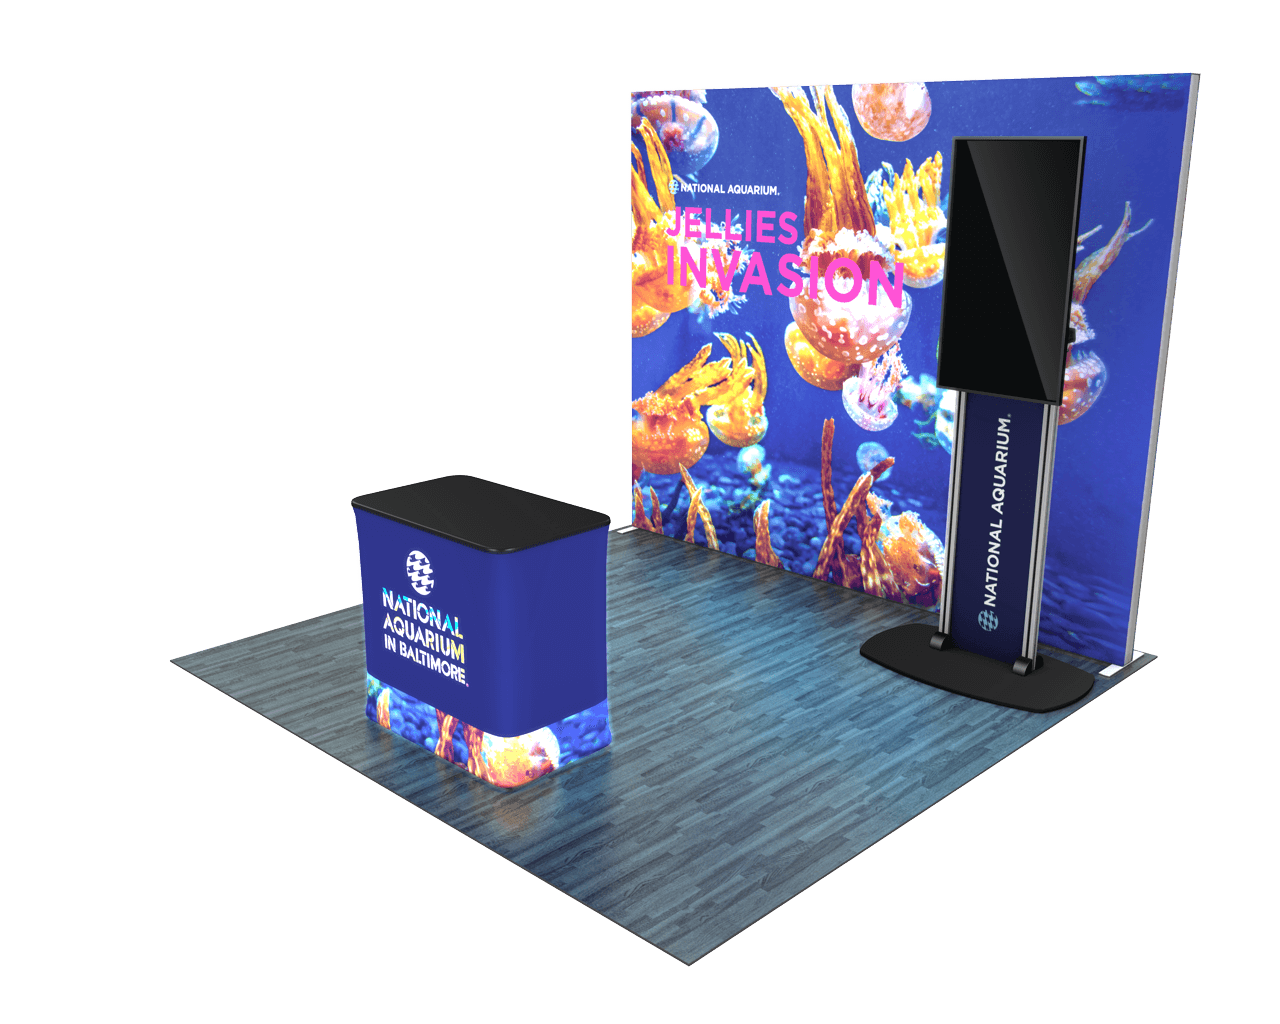 Infinity Pro Backlit 10ft Trade Show Display Kit - 10.05